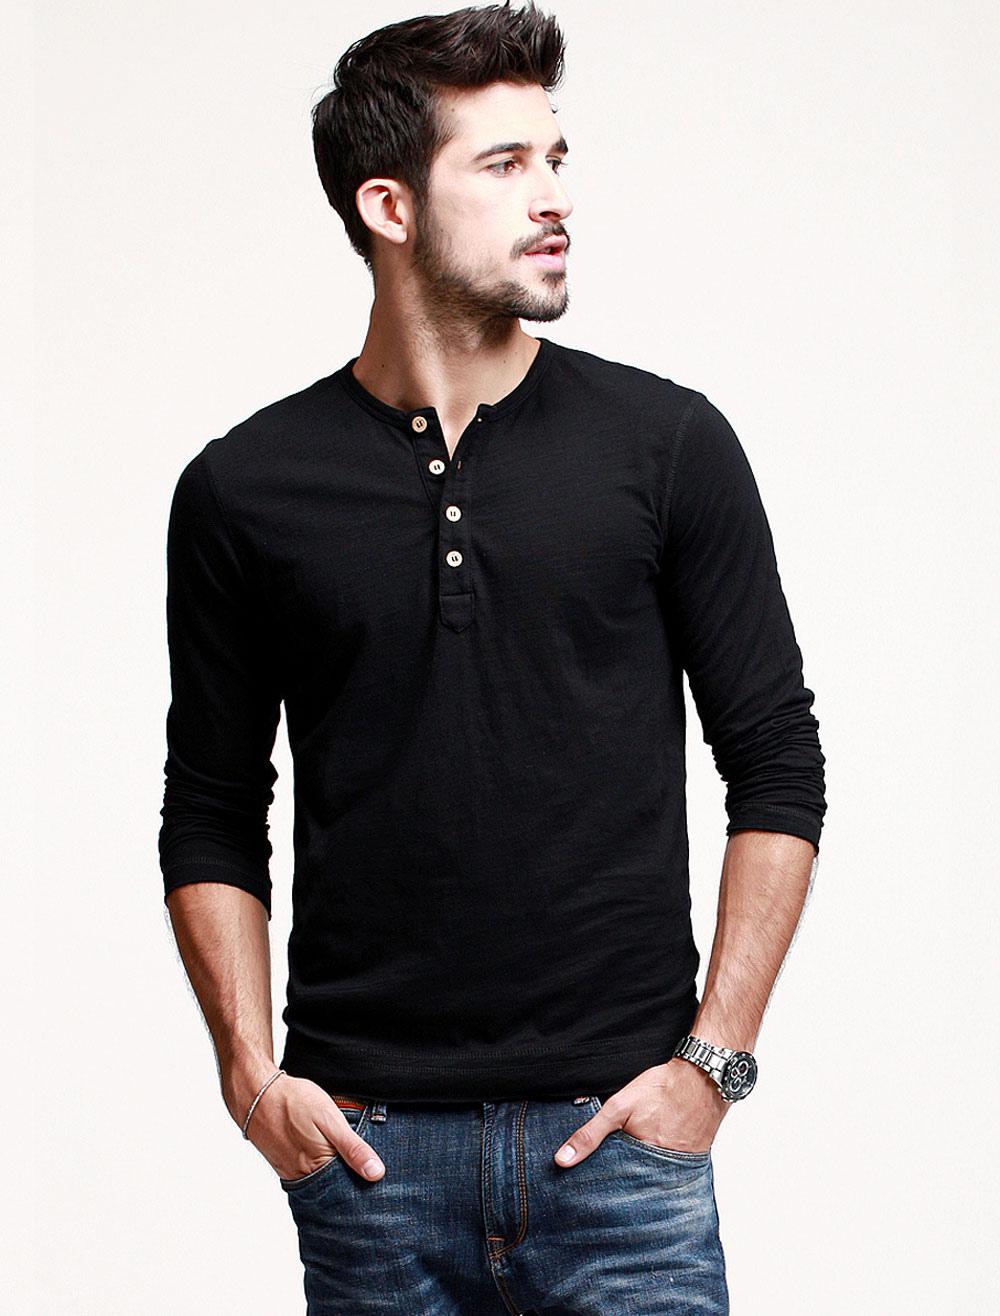 2223a324ebb7 Camiseta cuello redondo botones manga larga algodón diario fresco de los  hombres